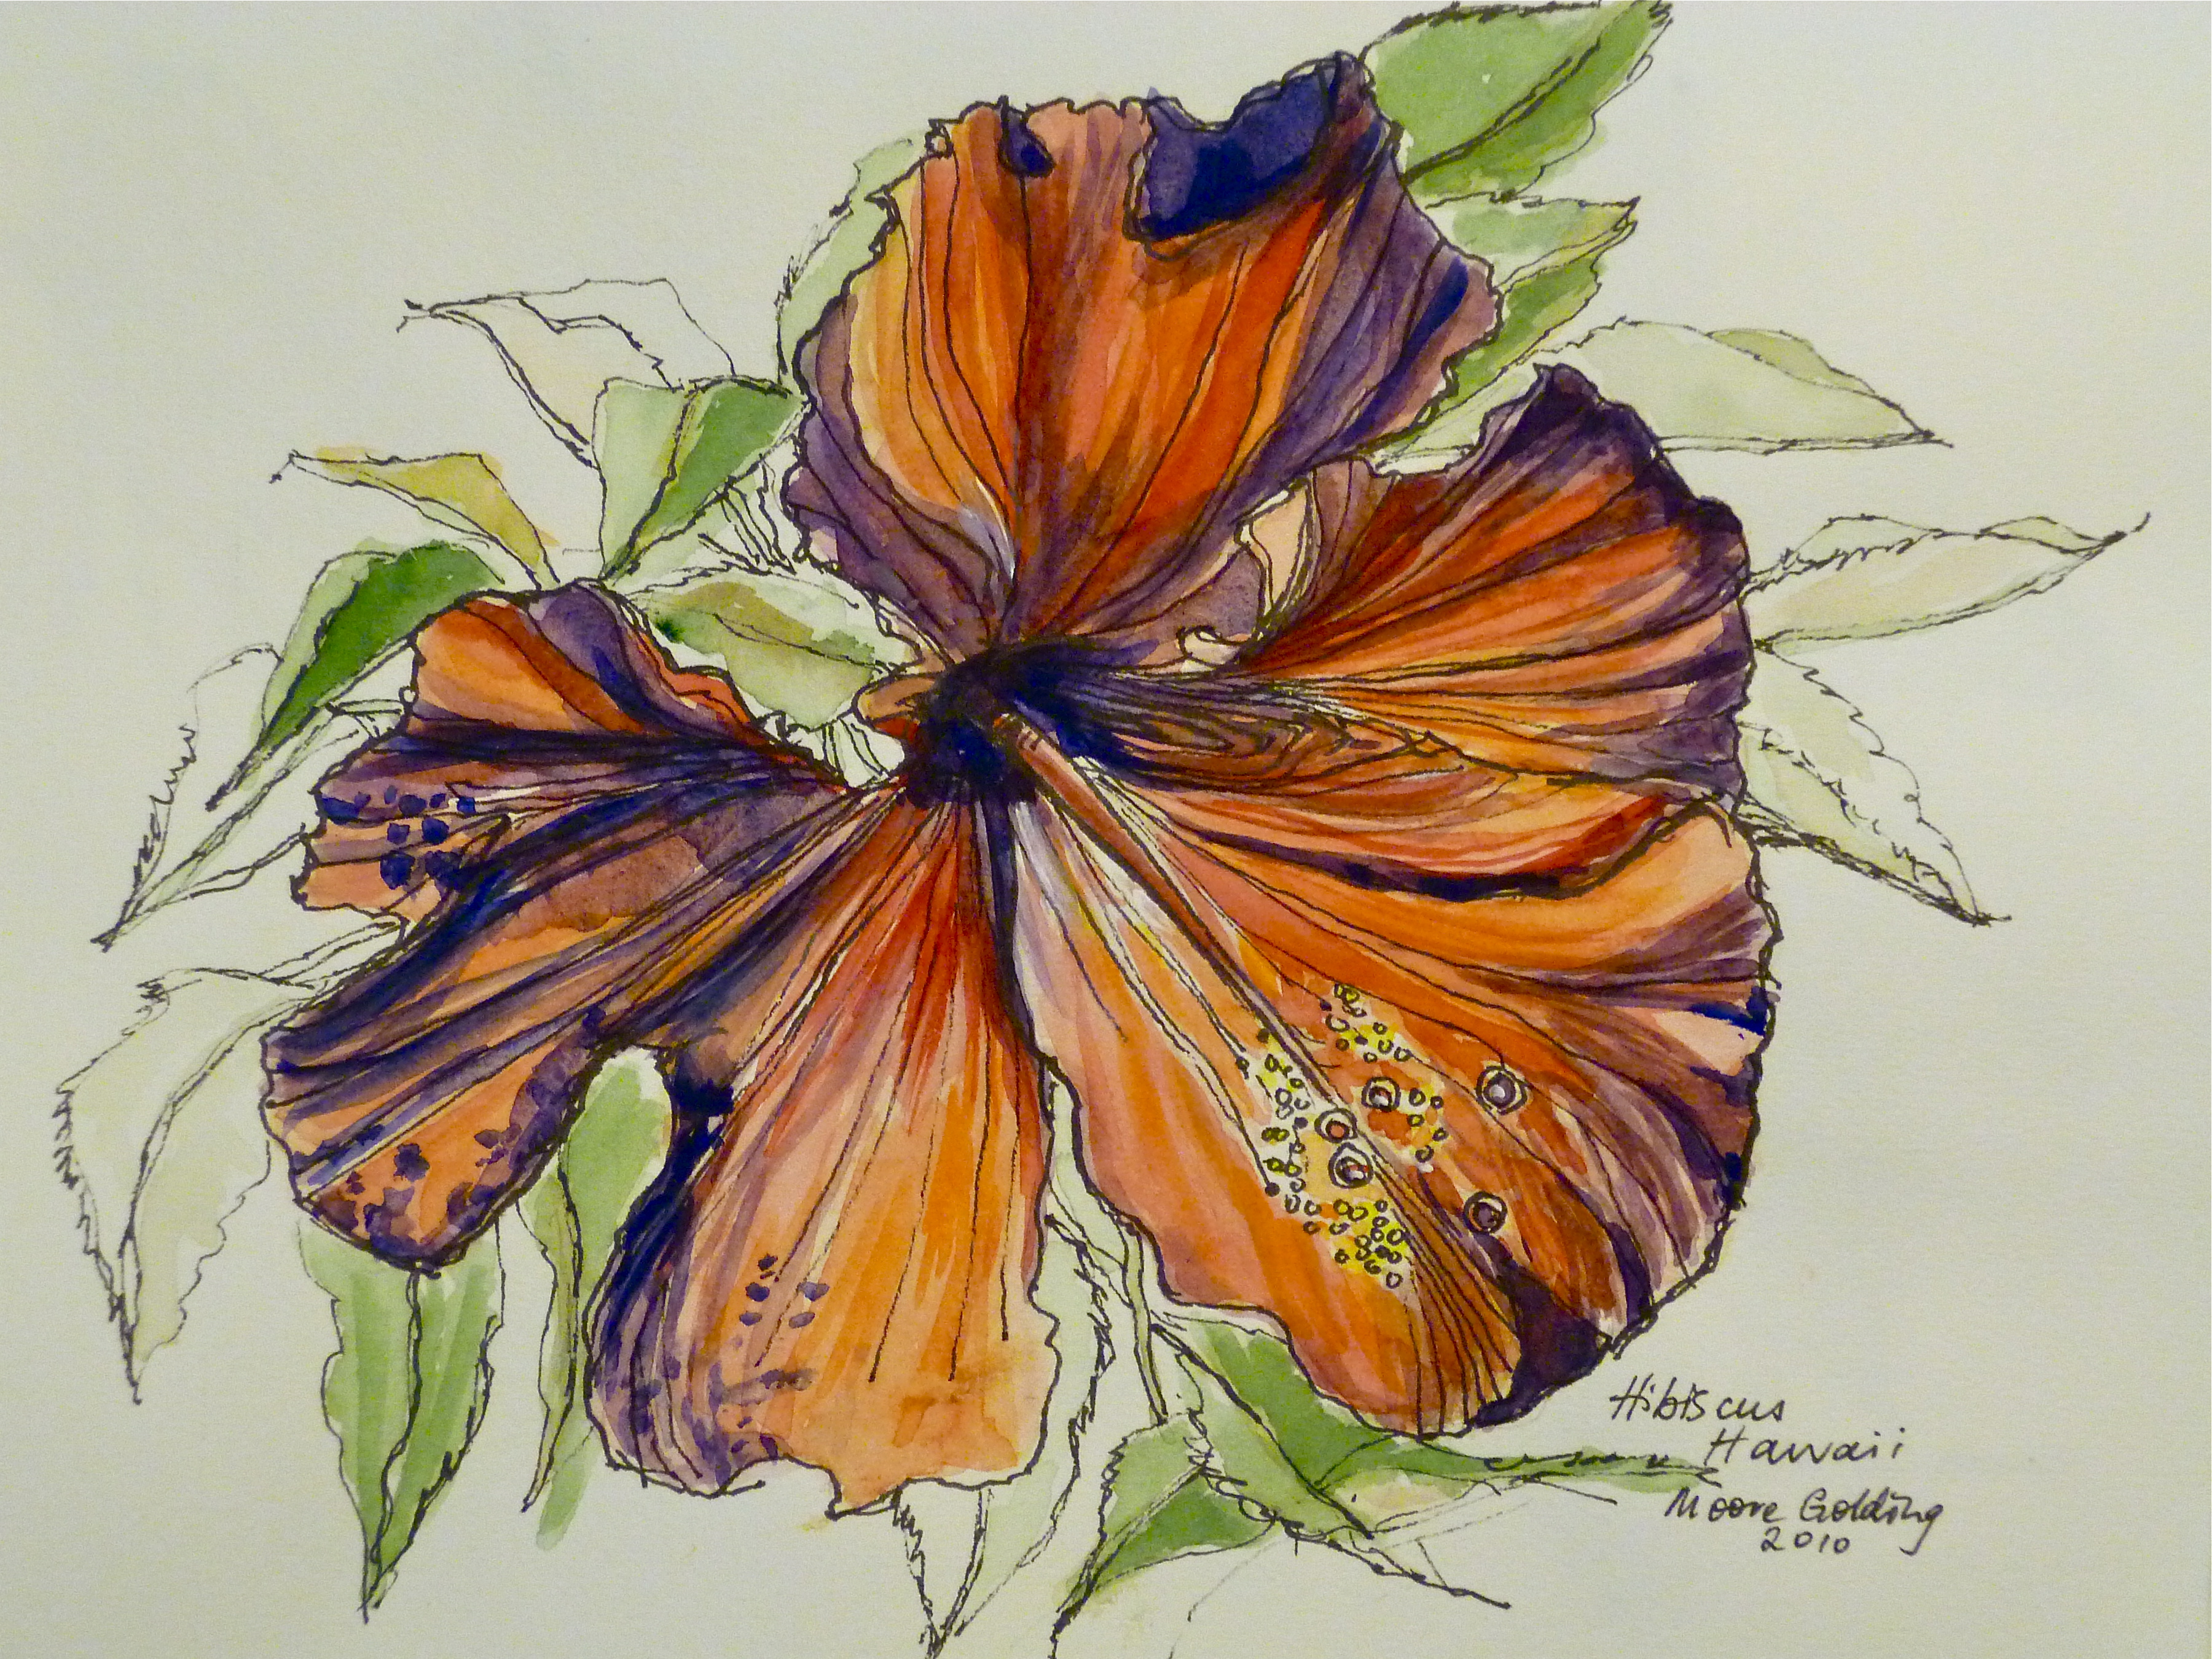 Hawaiian flowers elizabeth moore golding read izmirmasajfo